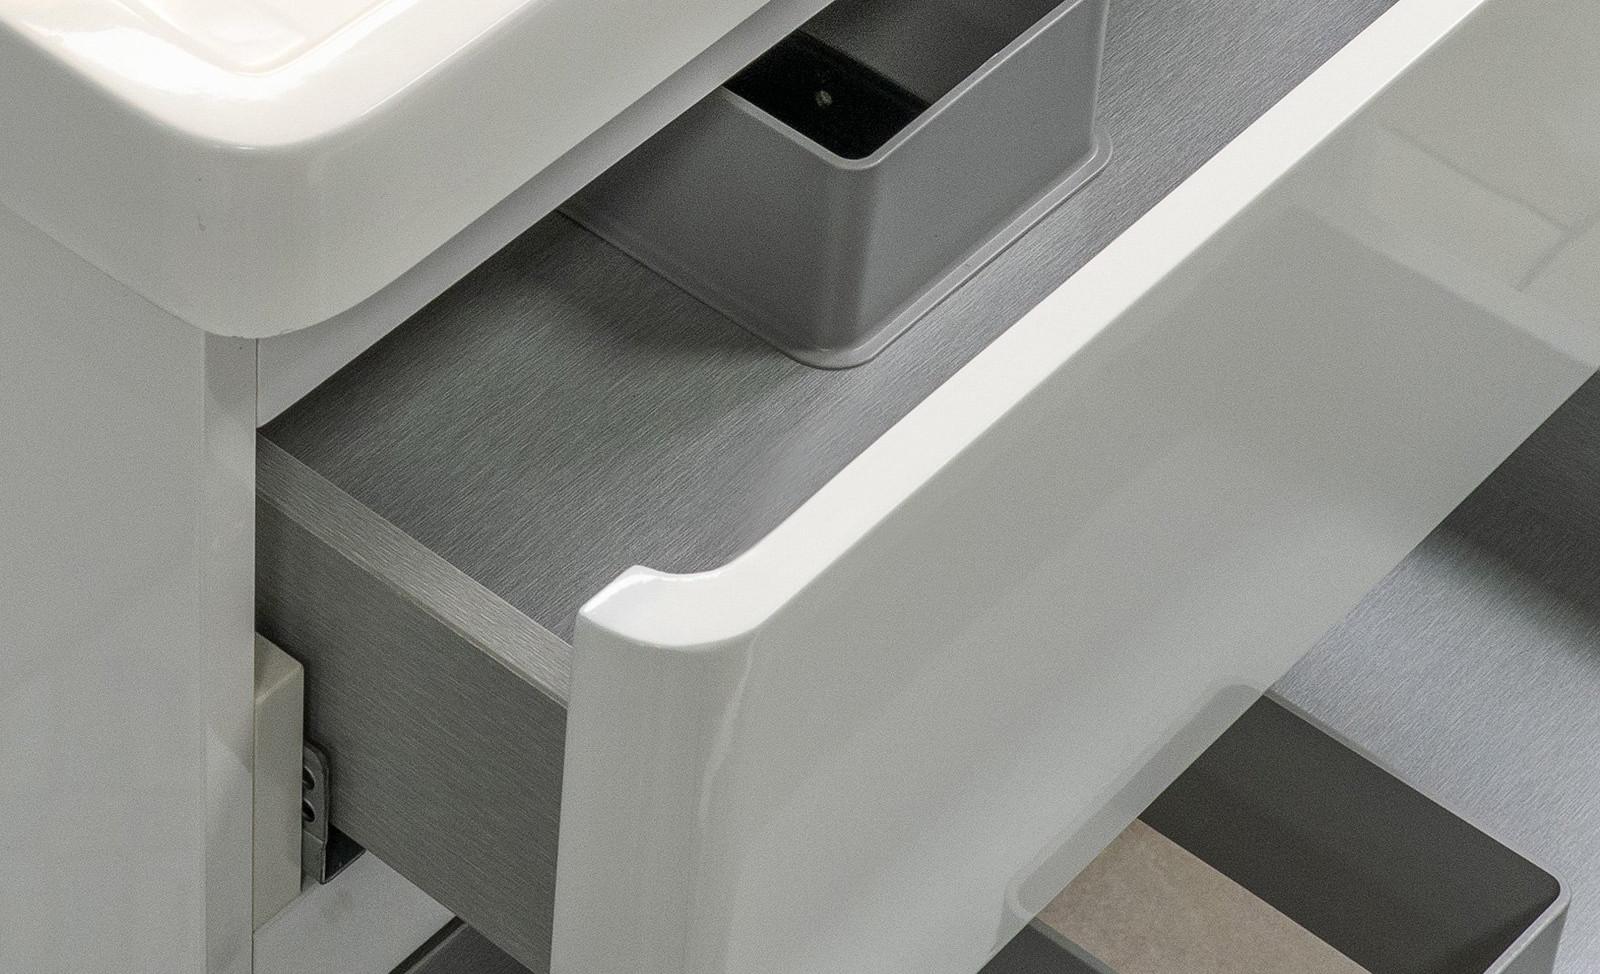 EC810-6 Cabinet